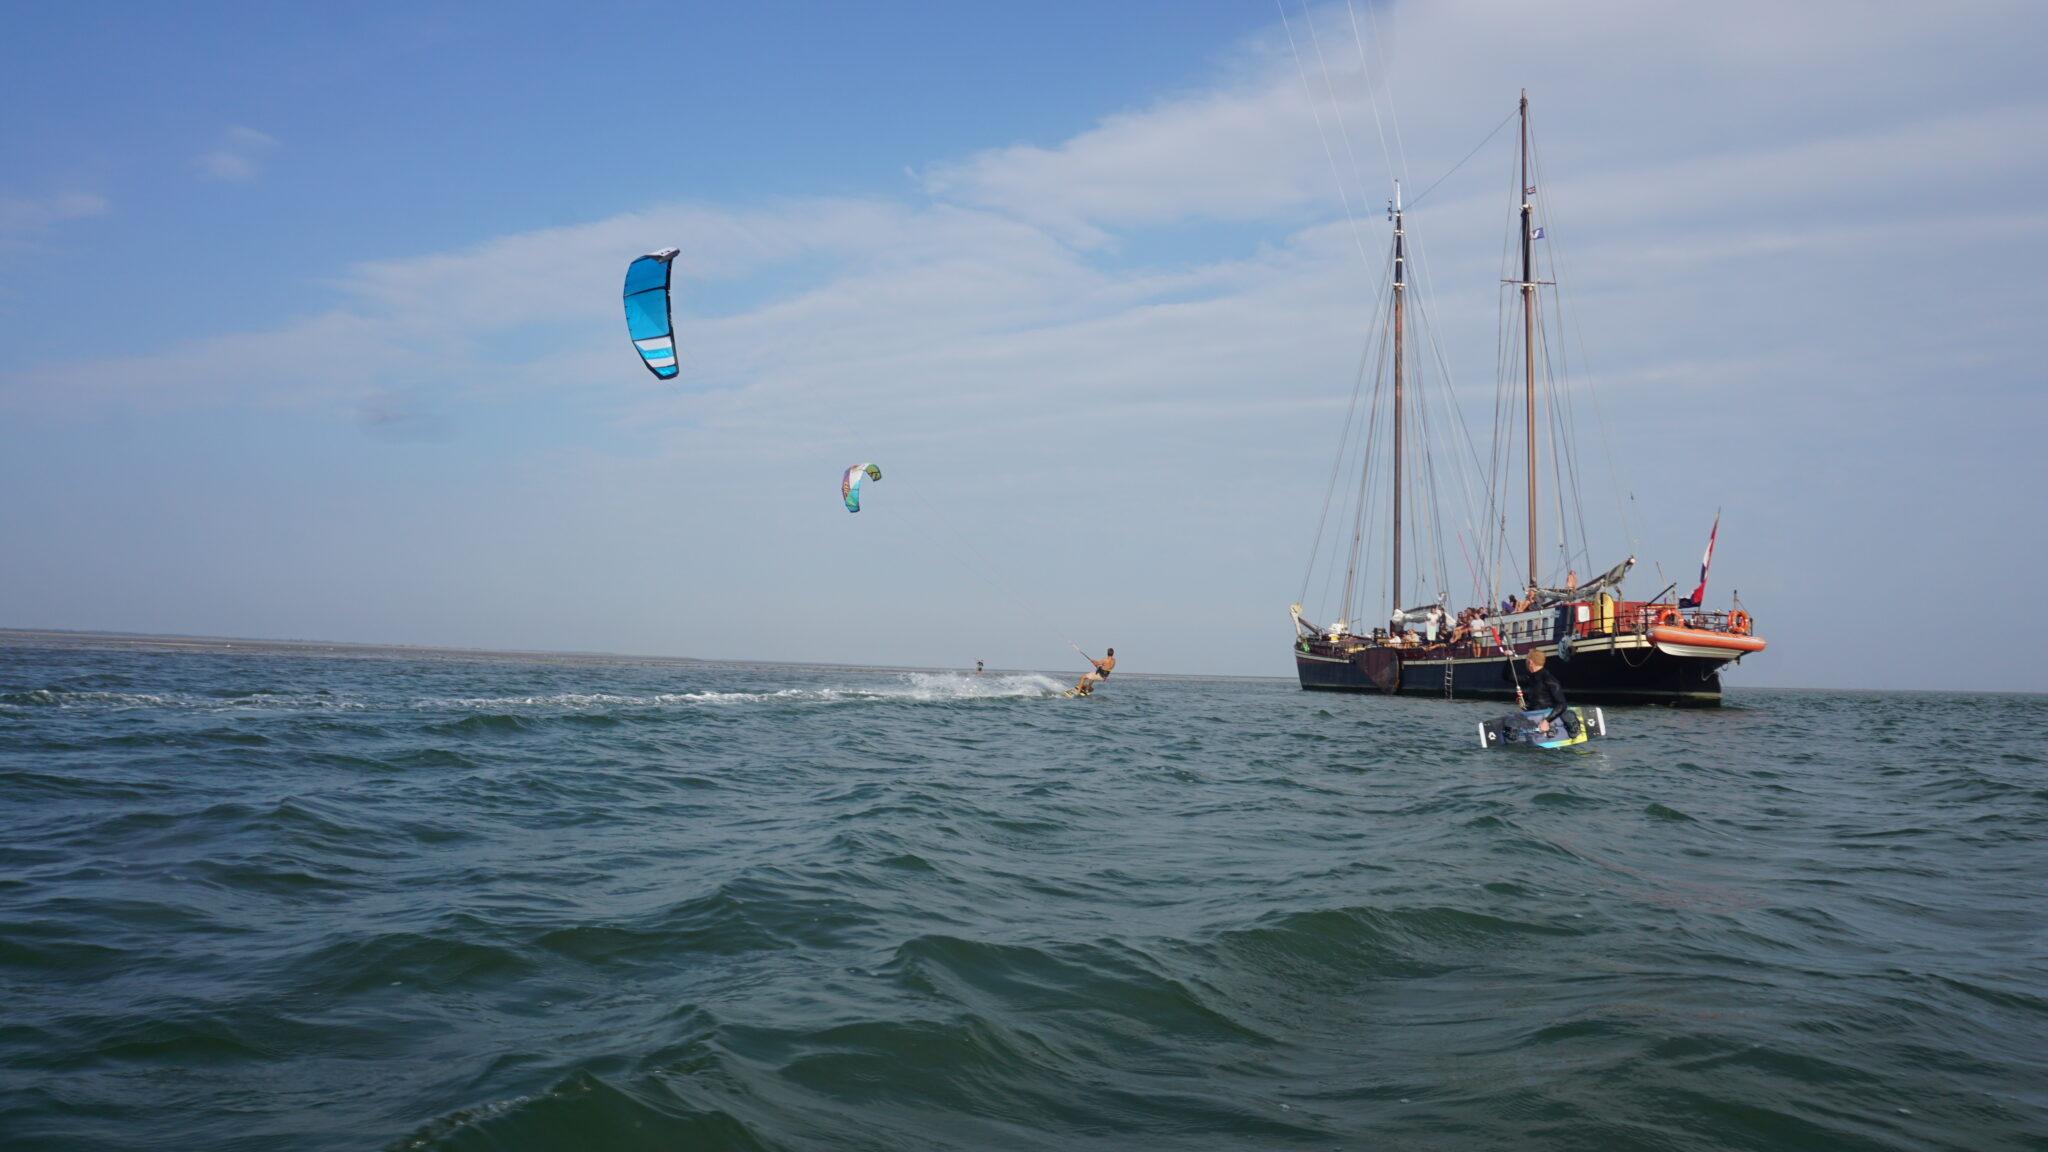 sail-kite-terschelling